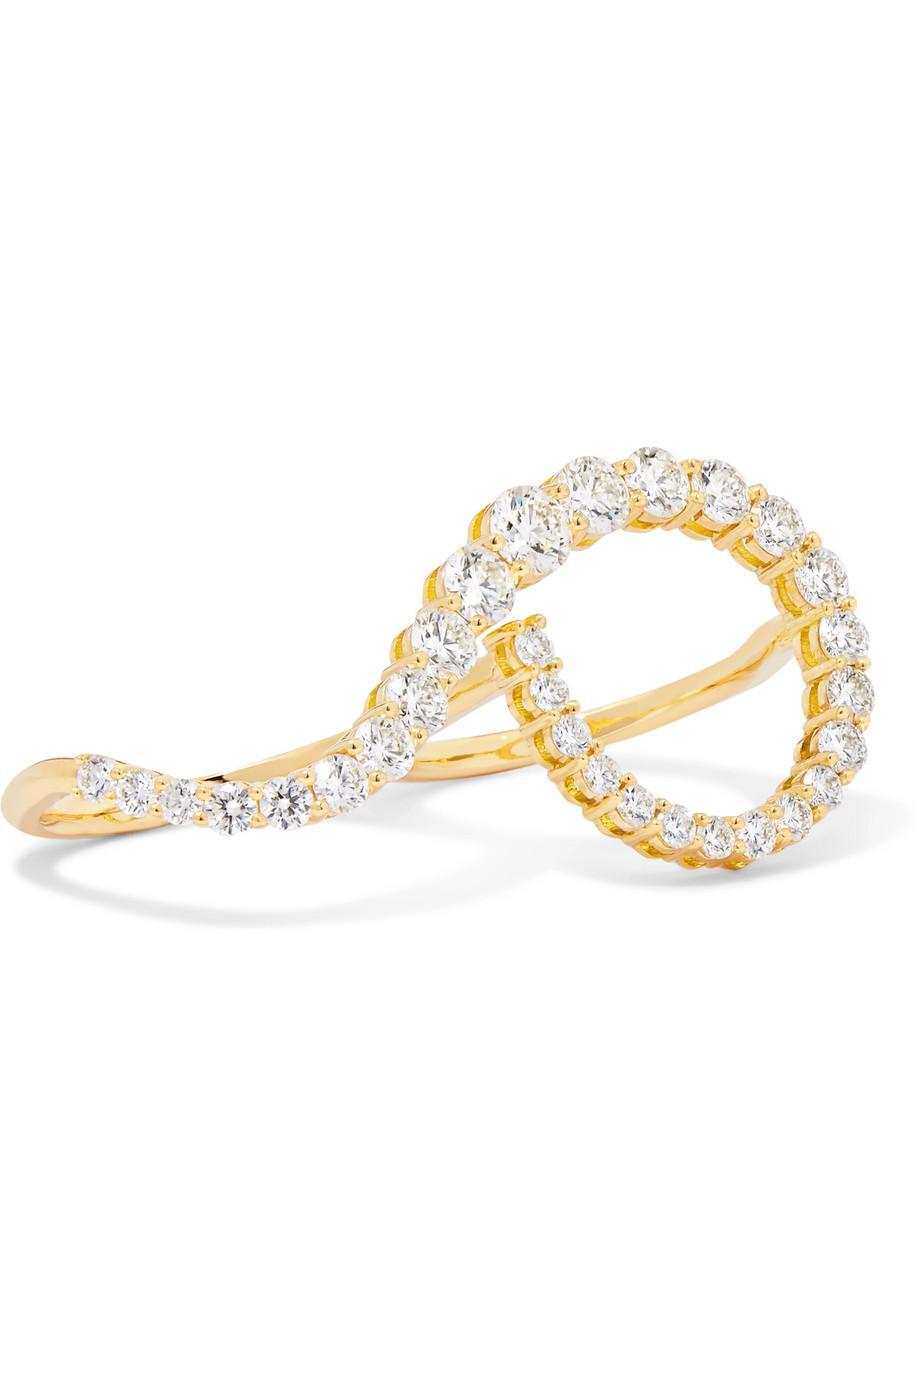 Melissa Kaye Aria Grace 18-karat Gold Diamond Two-finger Ring Okx19